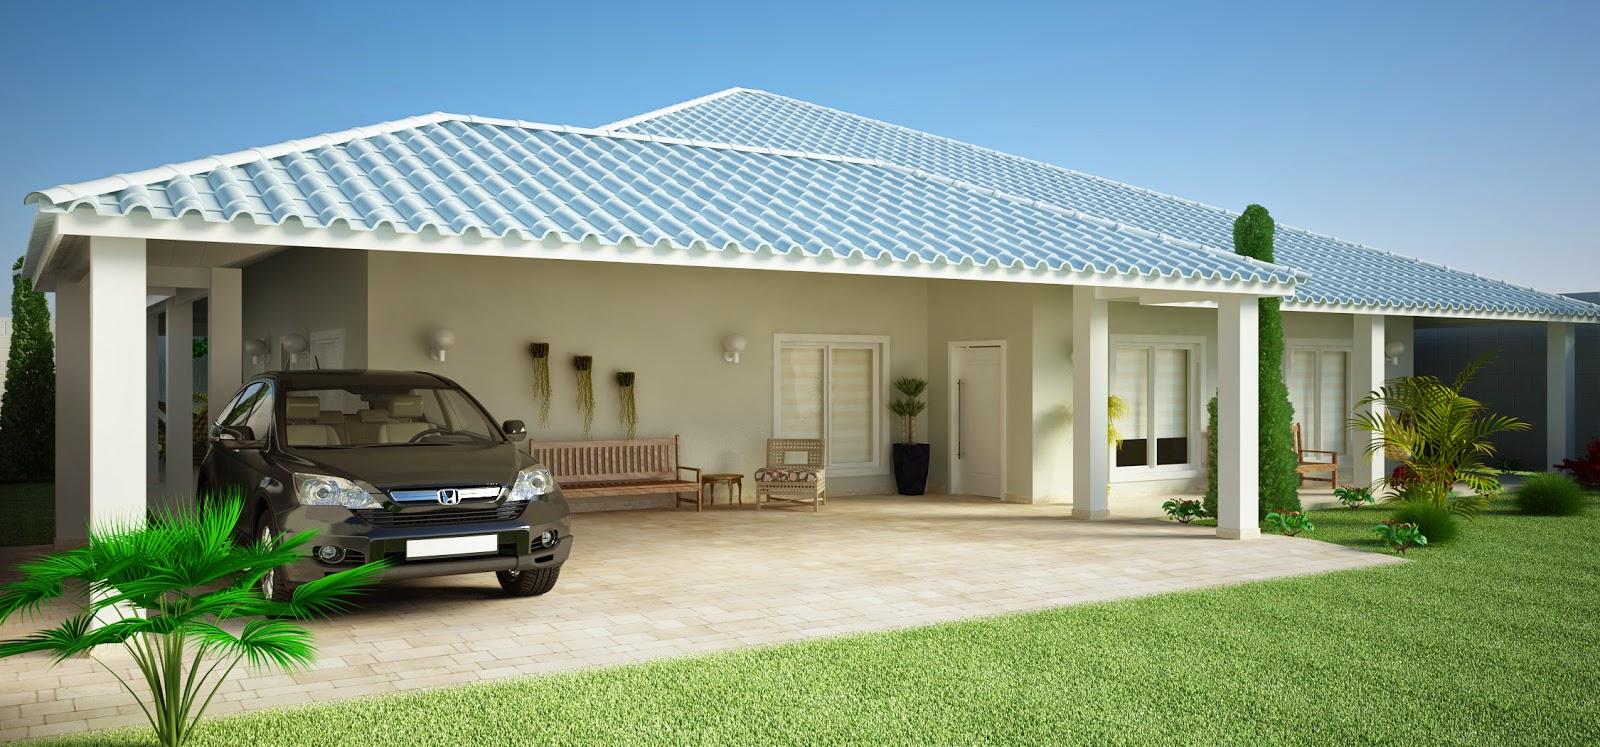 Maquete eletr nica casa de campo moderna for Casa moderna en el campo